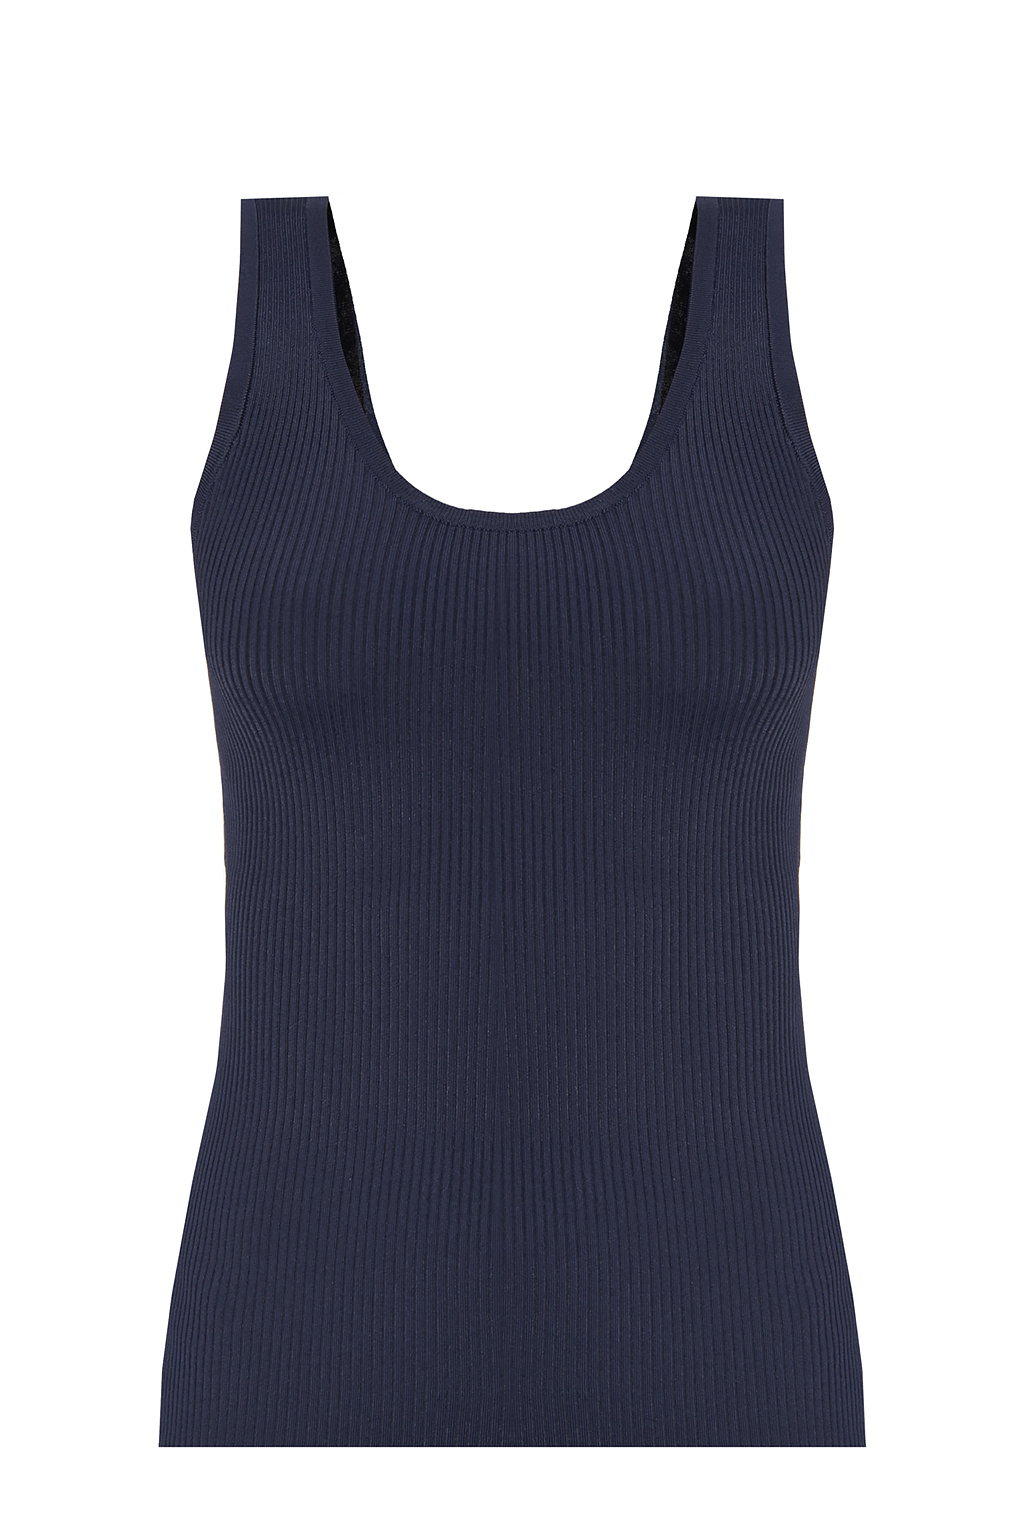 Zimmermann Ribbed sleeveless top